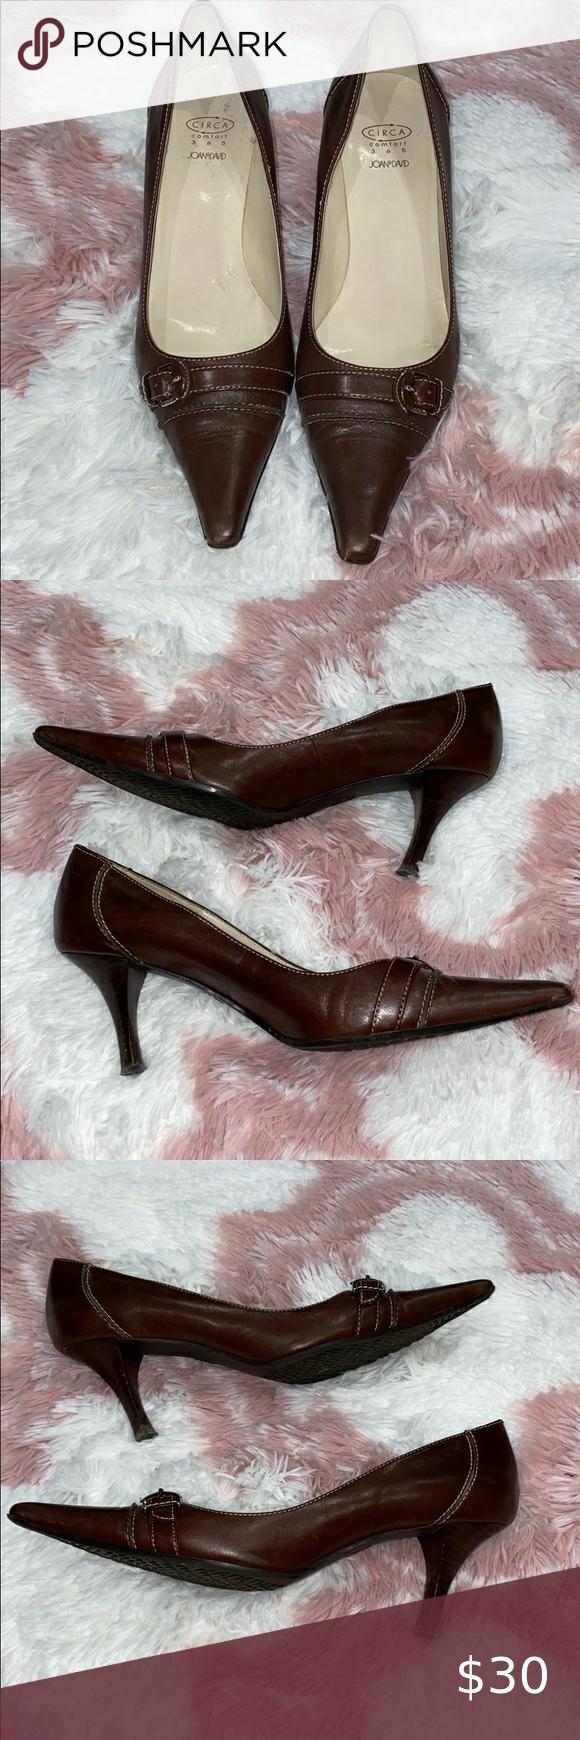 Joan David Buckle Pointed Kitten Heels In 2020 Heels Kitten Heels Shoes Women Heels